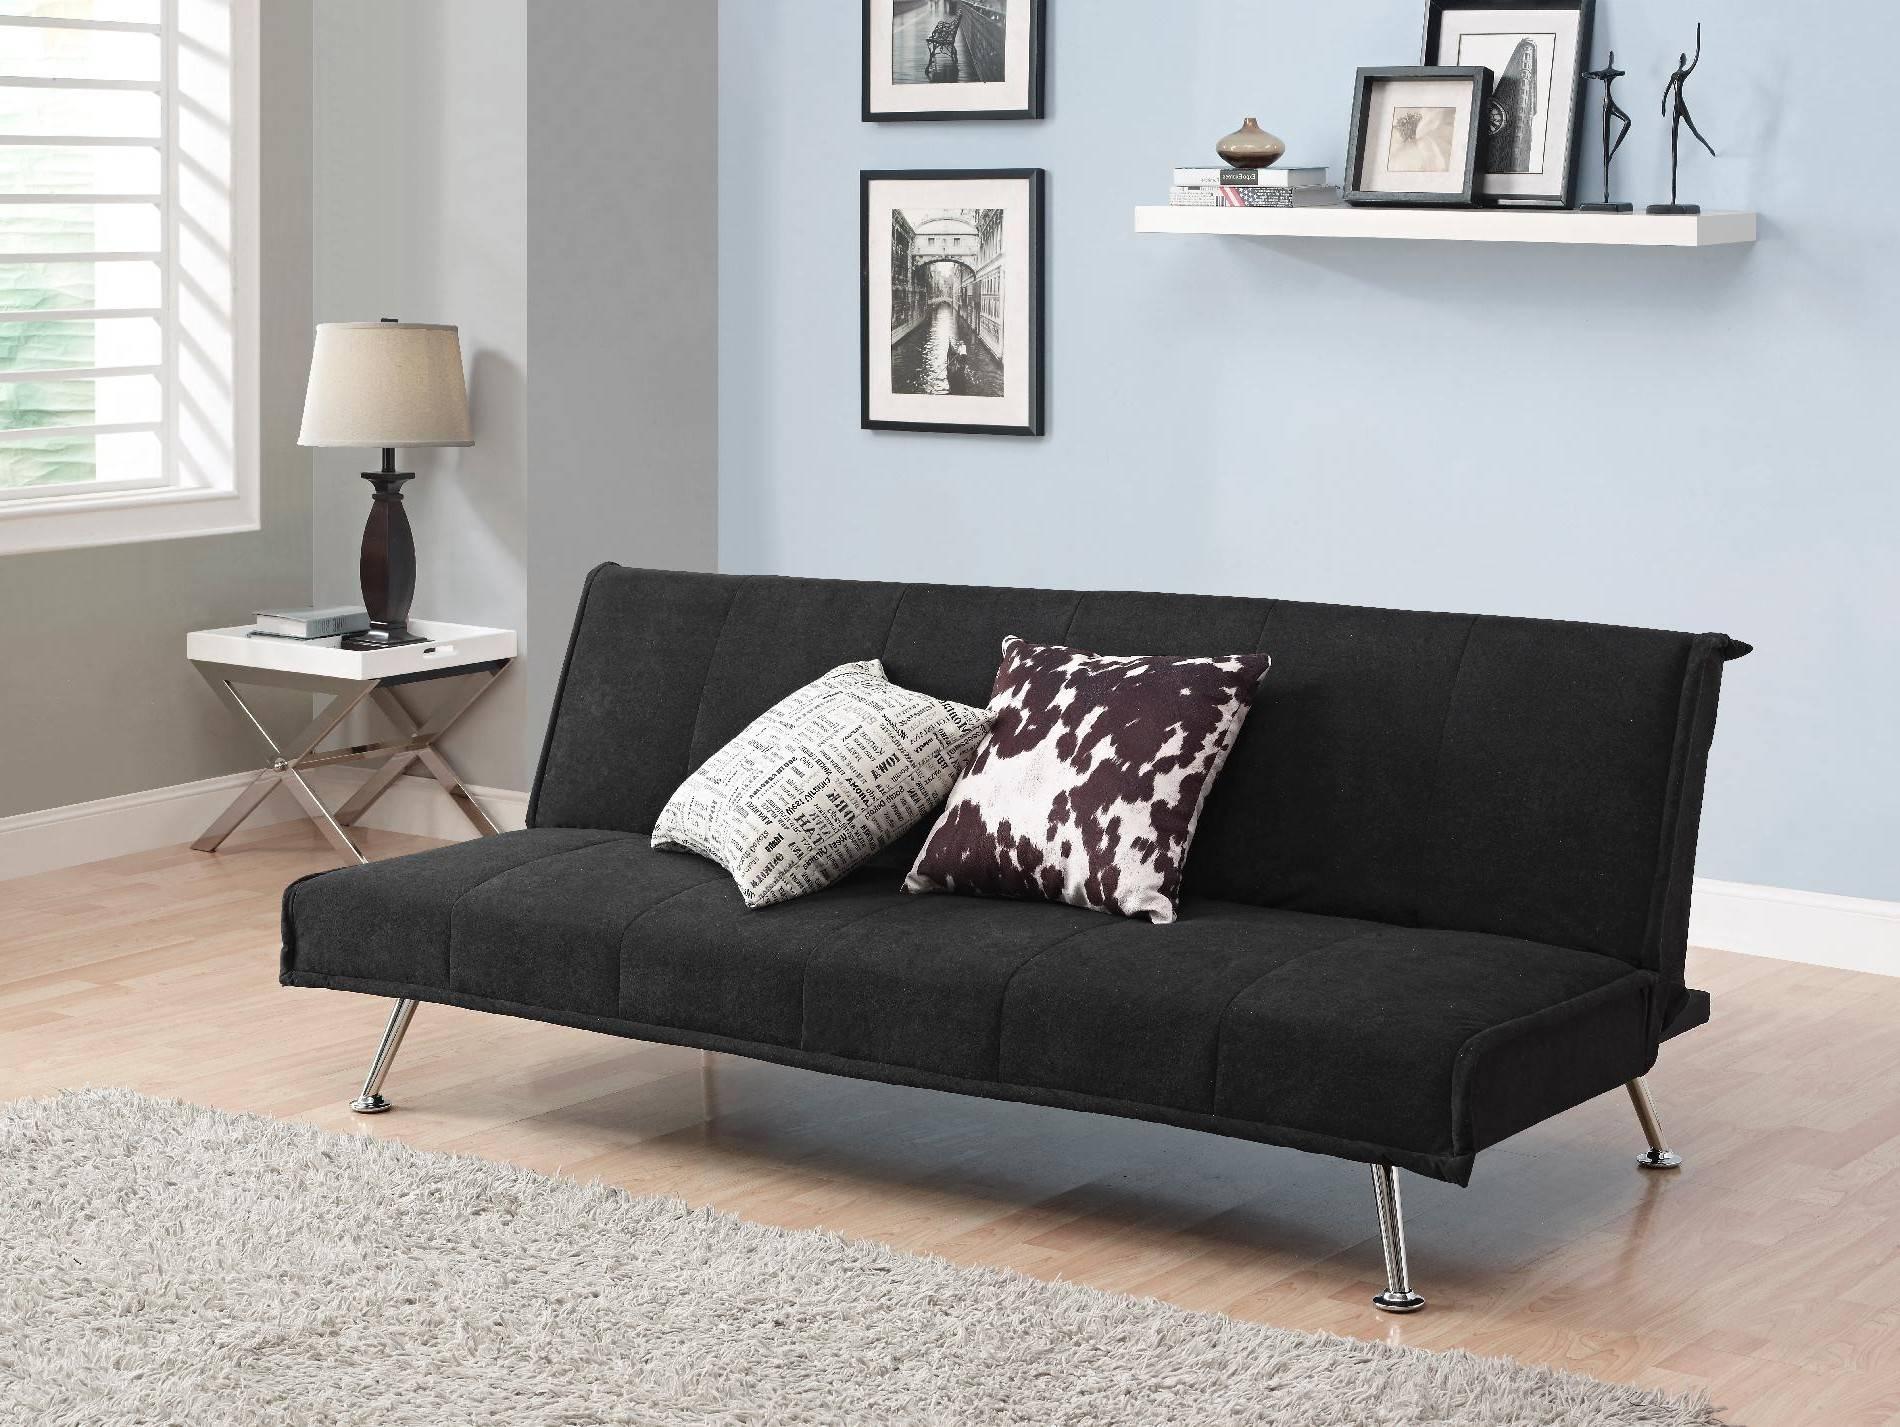 Sofas Center : Striking Sleeper Sofa Big Lots Image Design At inside Big Lots Sofa (Image 29 of 30)